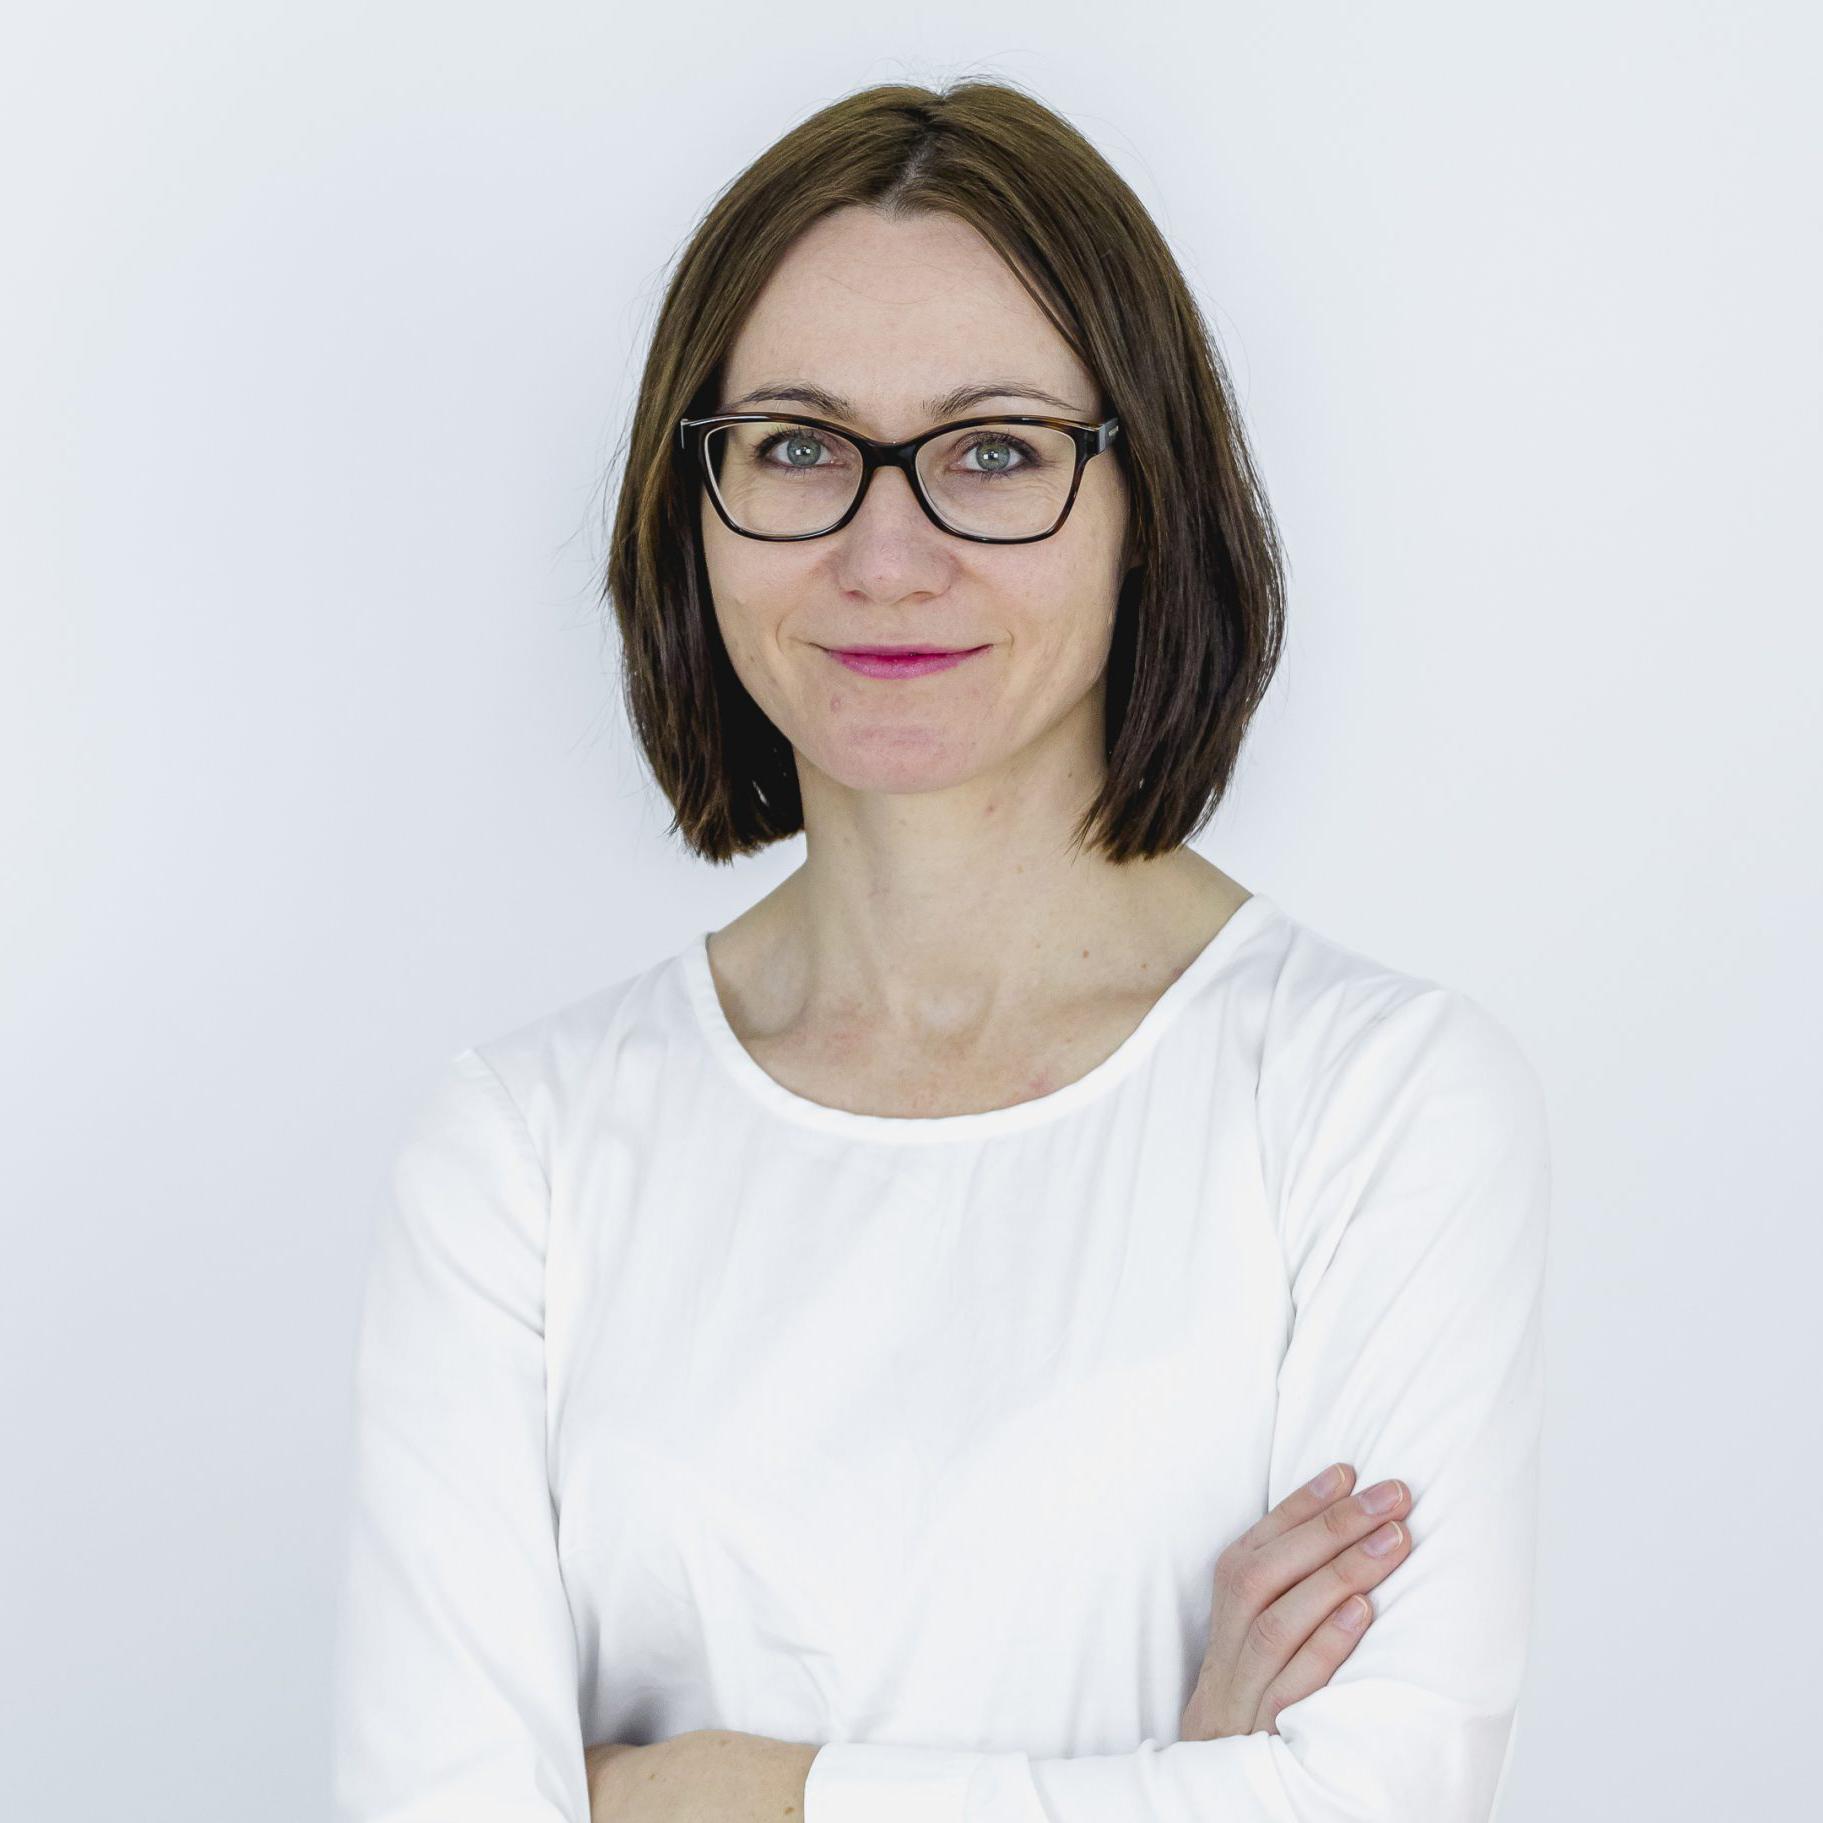 Anna Sarnacka-Smith